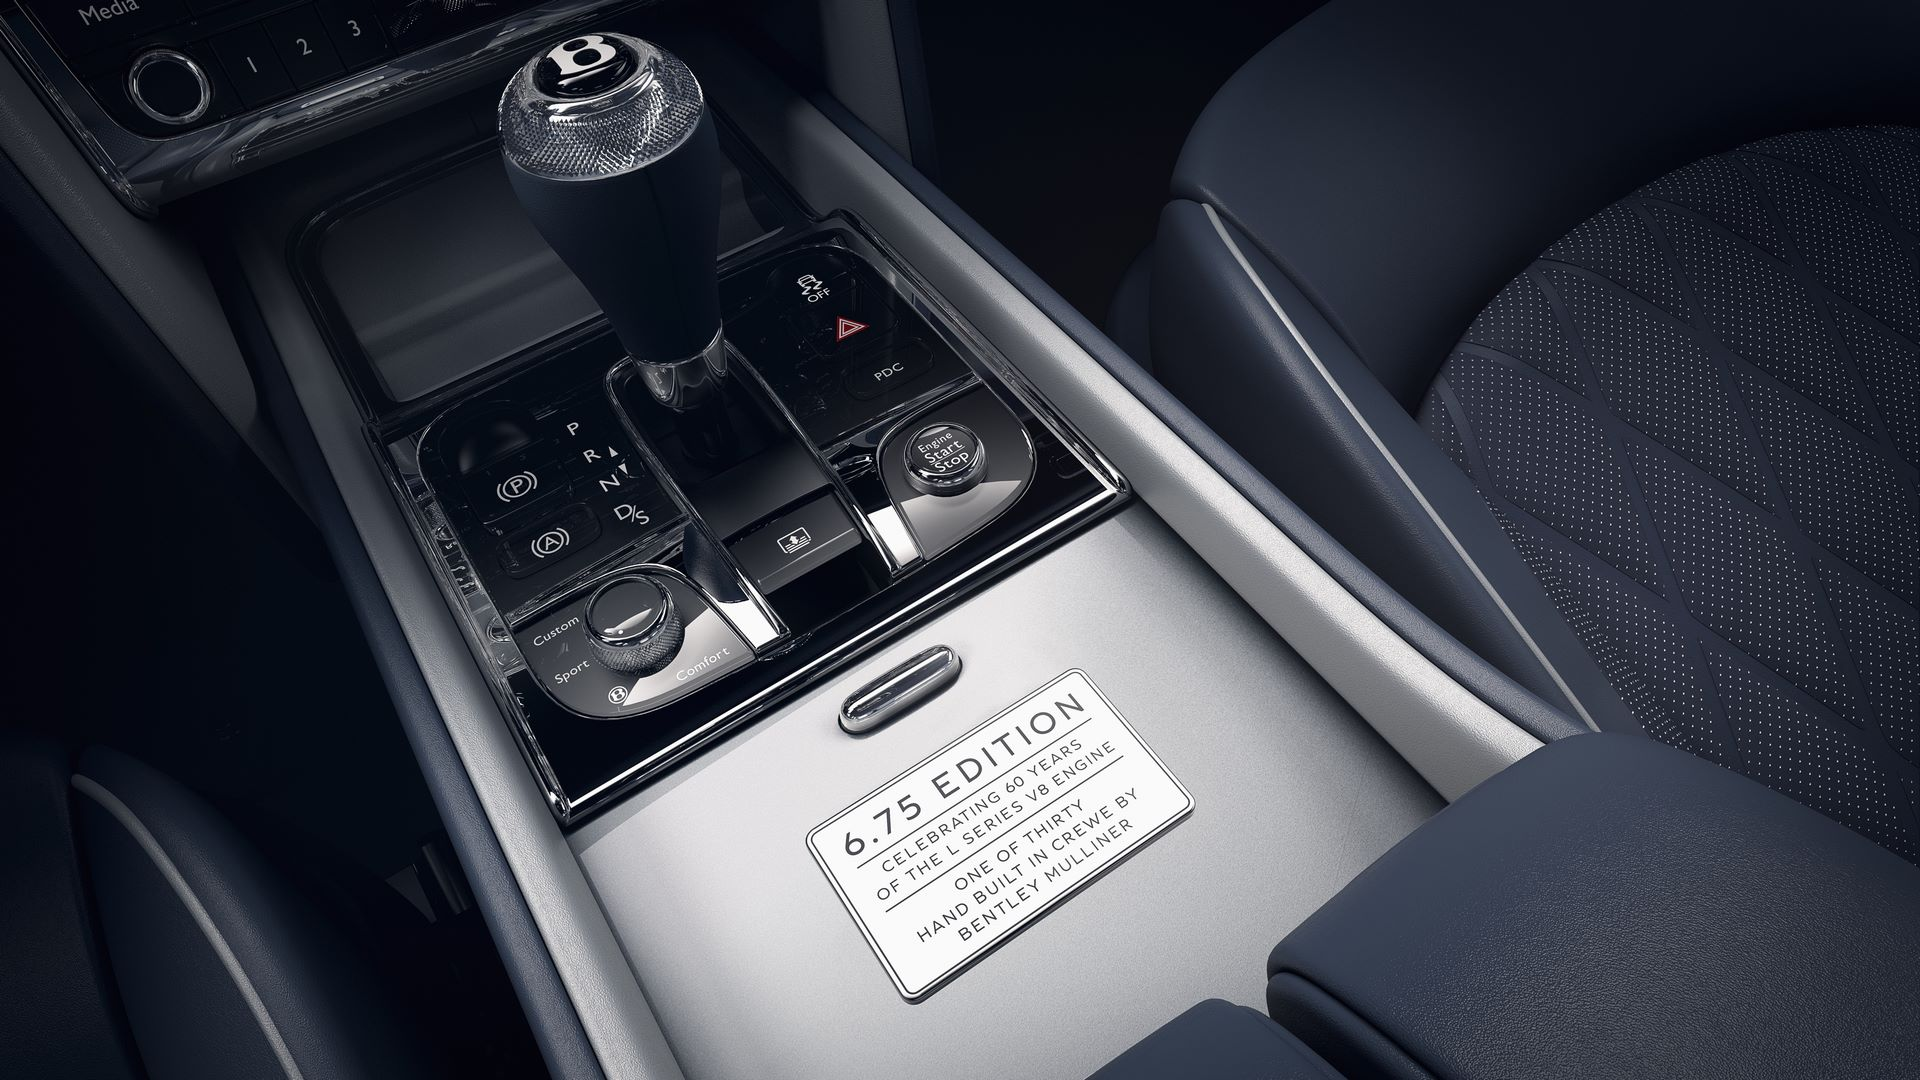 Bentley-Mulsanne-6.75-Edition-By-Mulliner-11